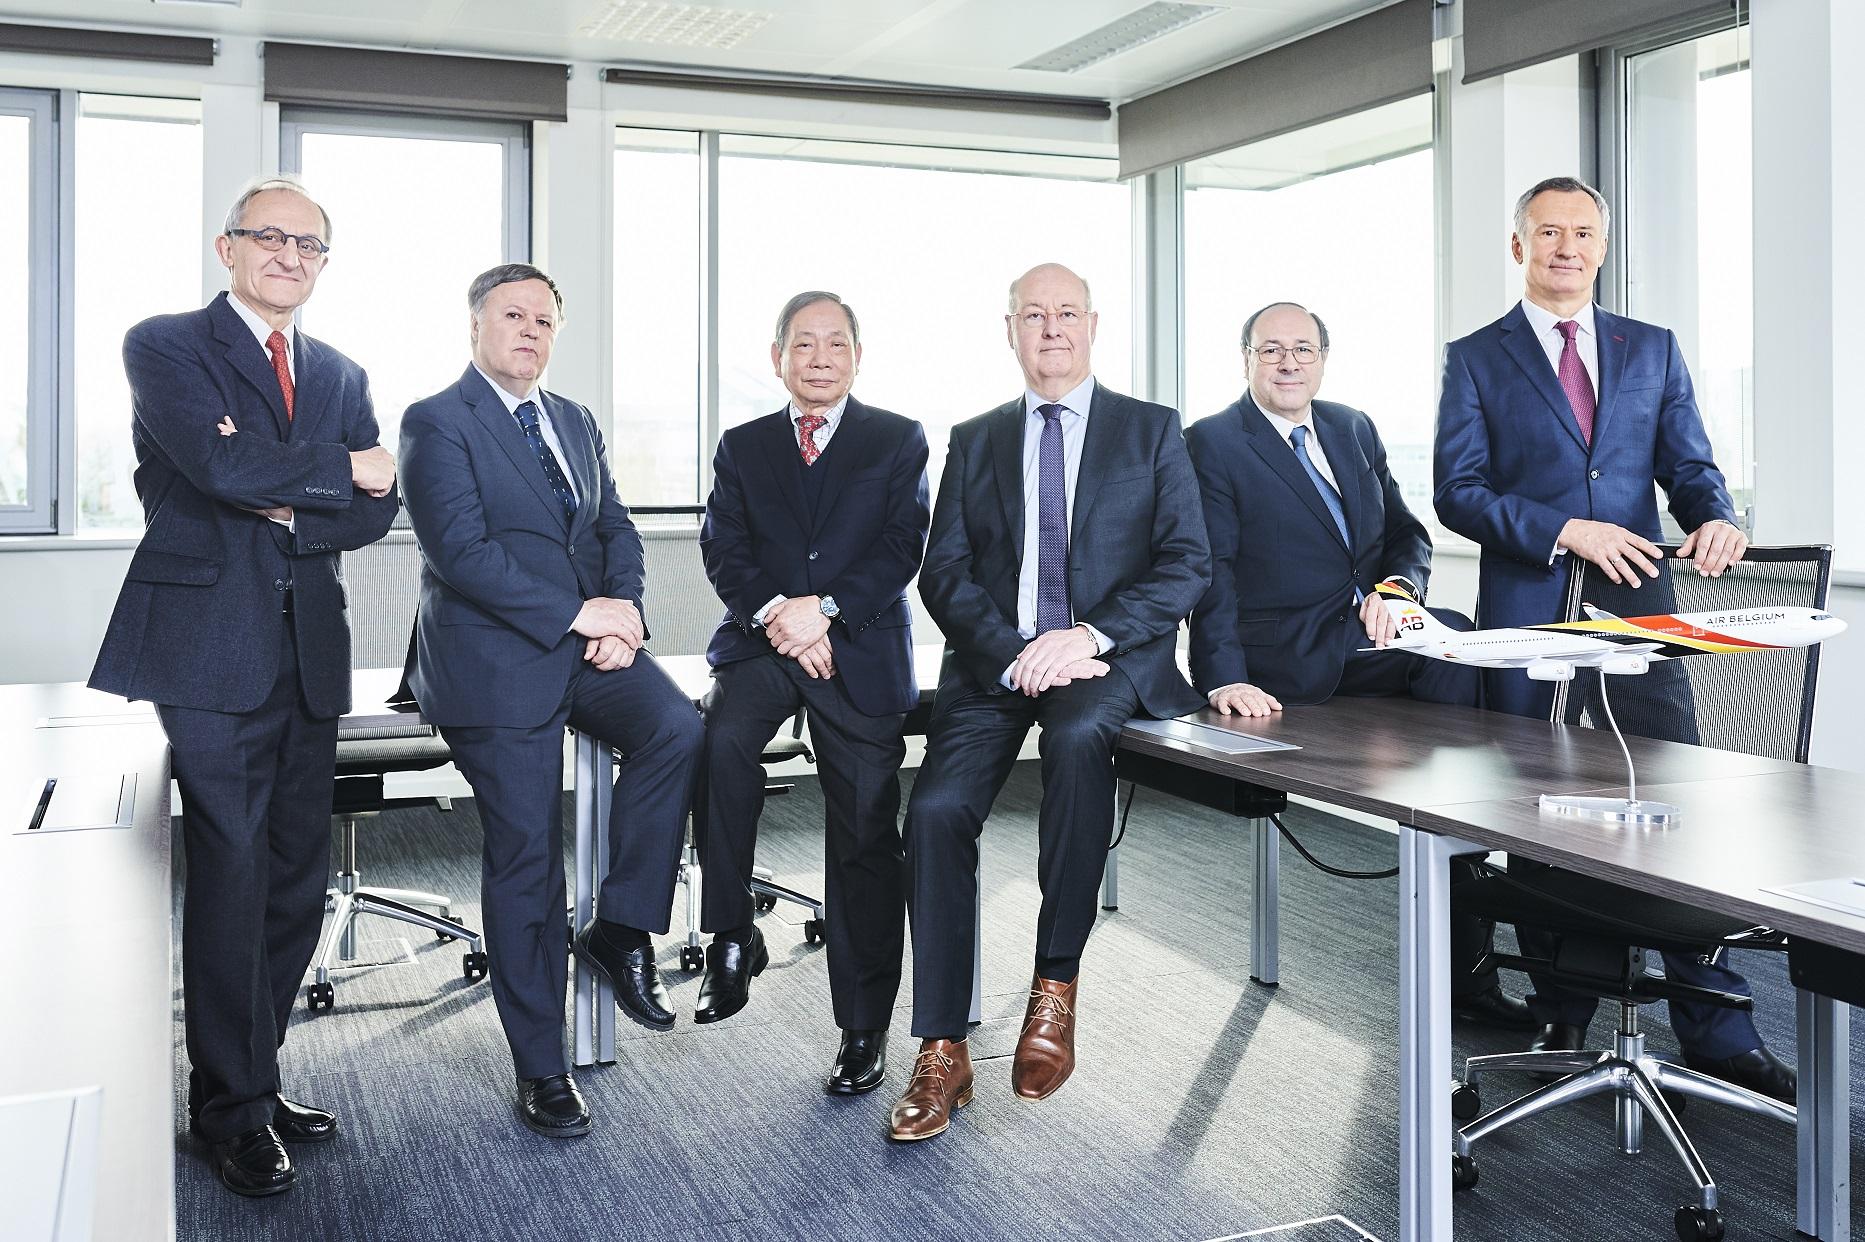 Aktionærerne i Air Belgium. Fra venstre mod højre:  Jean-Marie Focant, Mikko Rautio, Peter Yip, Niky Terzakis, Eric Bauche og Alexey Sumchenko  (Foto: Air Belgium)